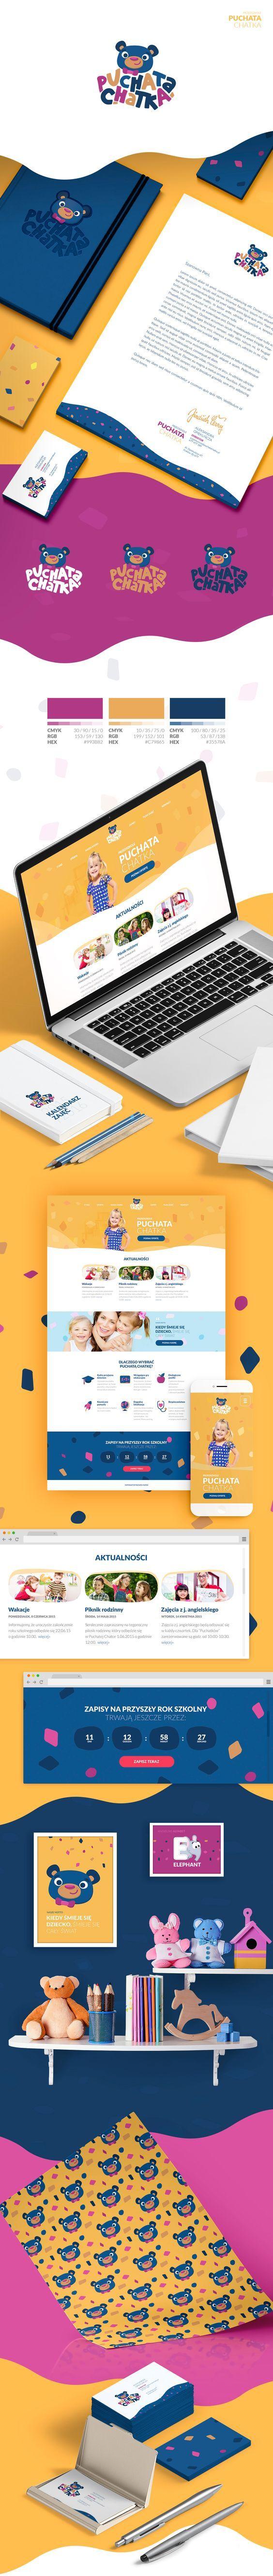 Przedszkole Puchata Chatka on Behance | Fivestar Branding – Design and Branding Agency & Inspiration Gallery